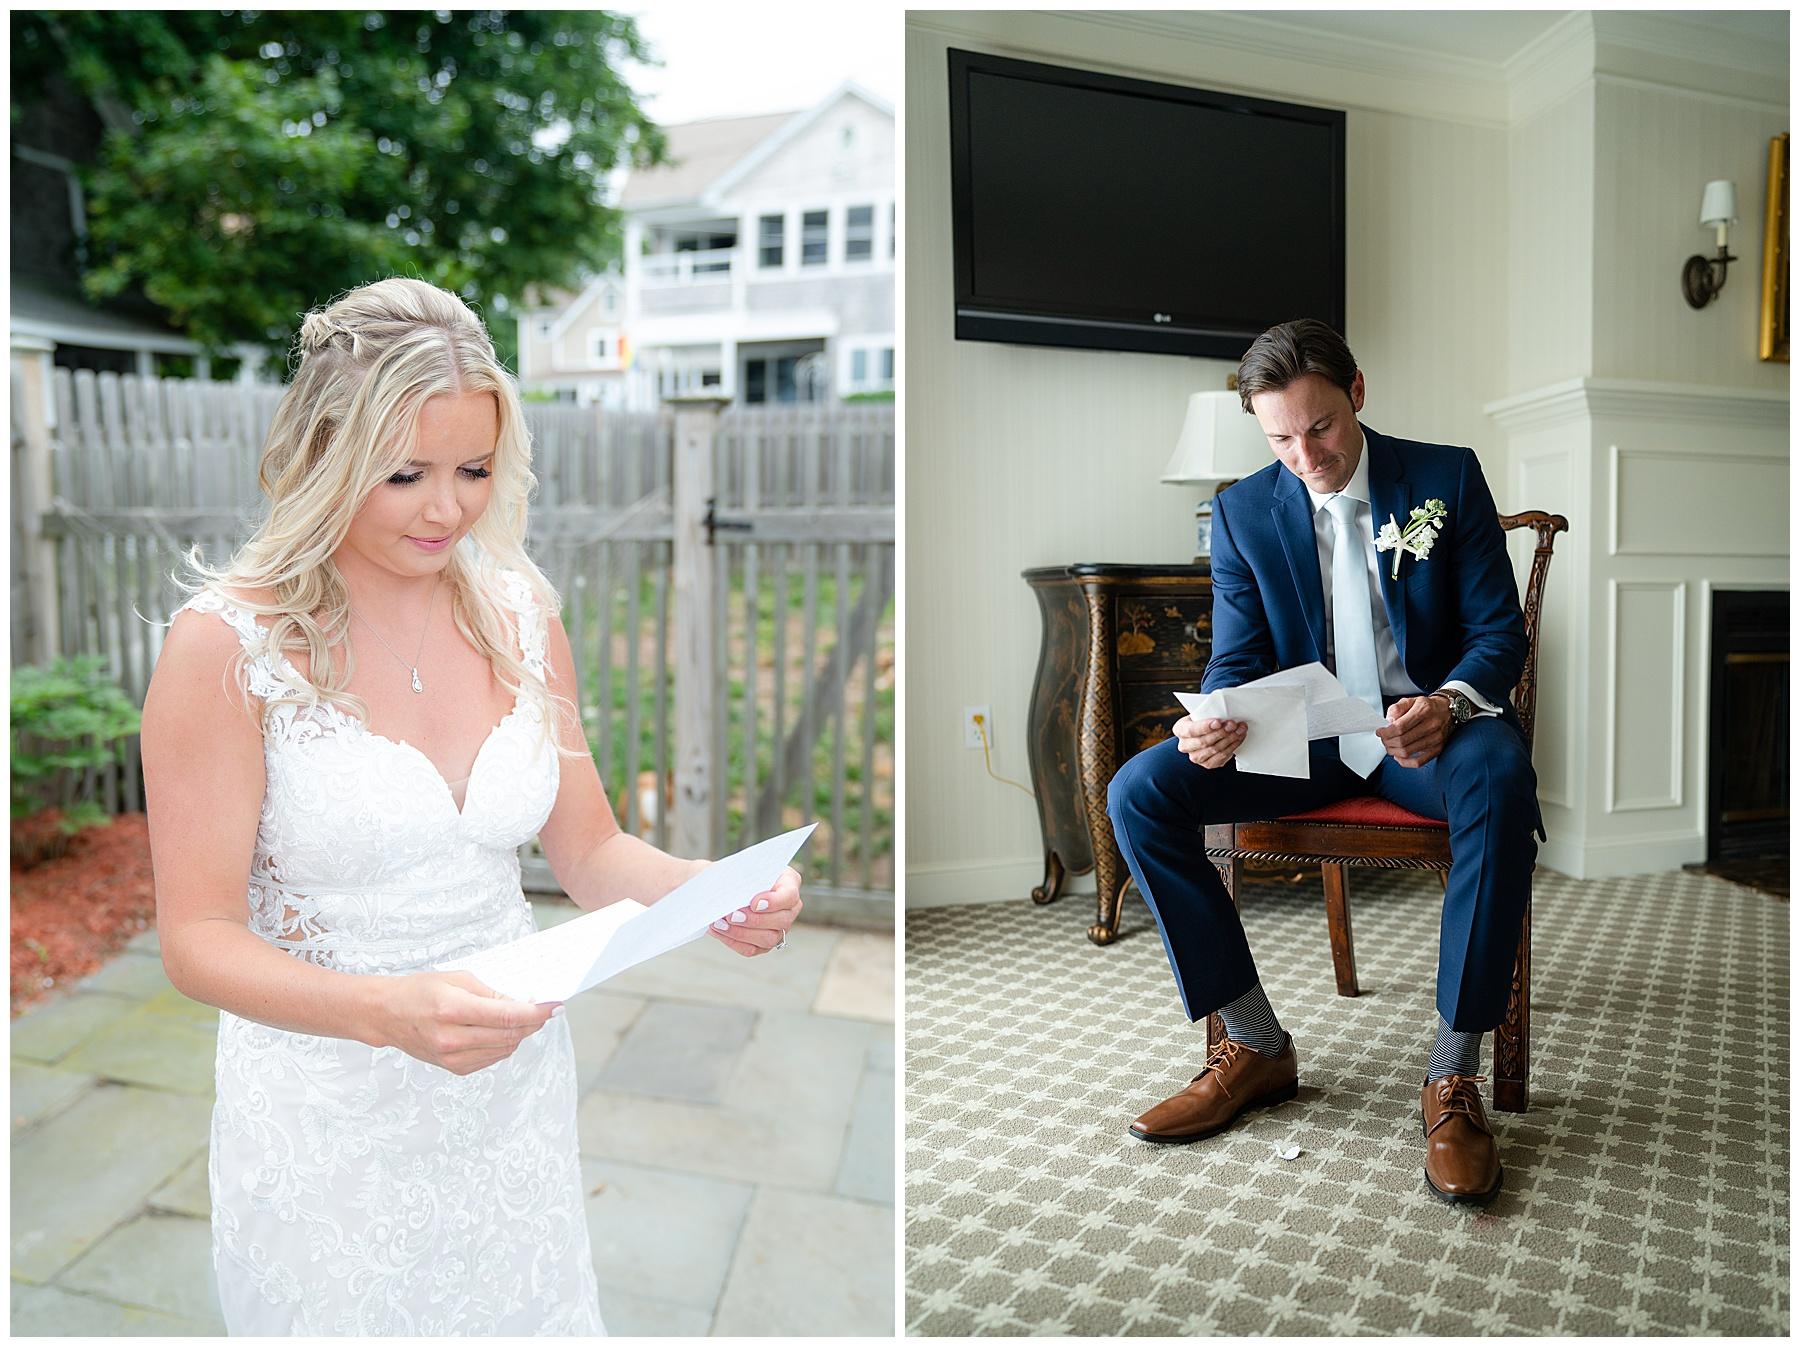 wedding day letter exchange